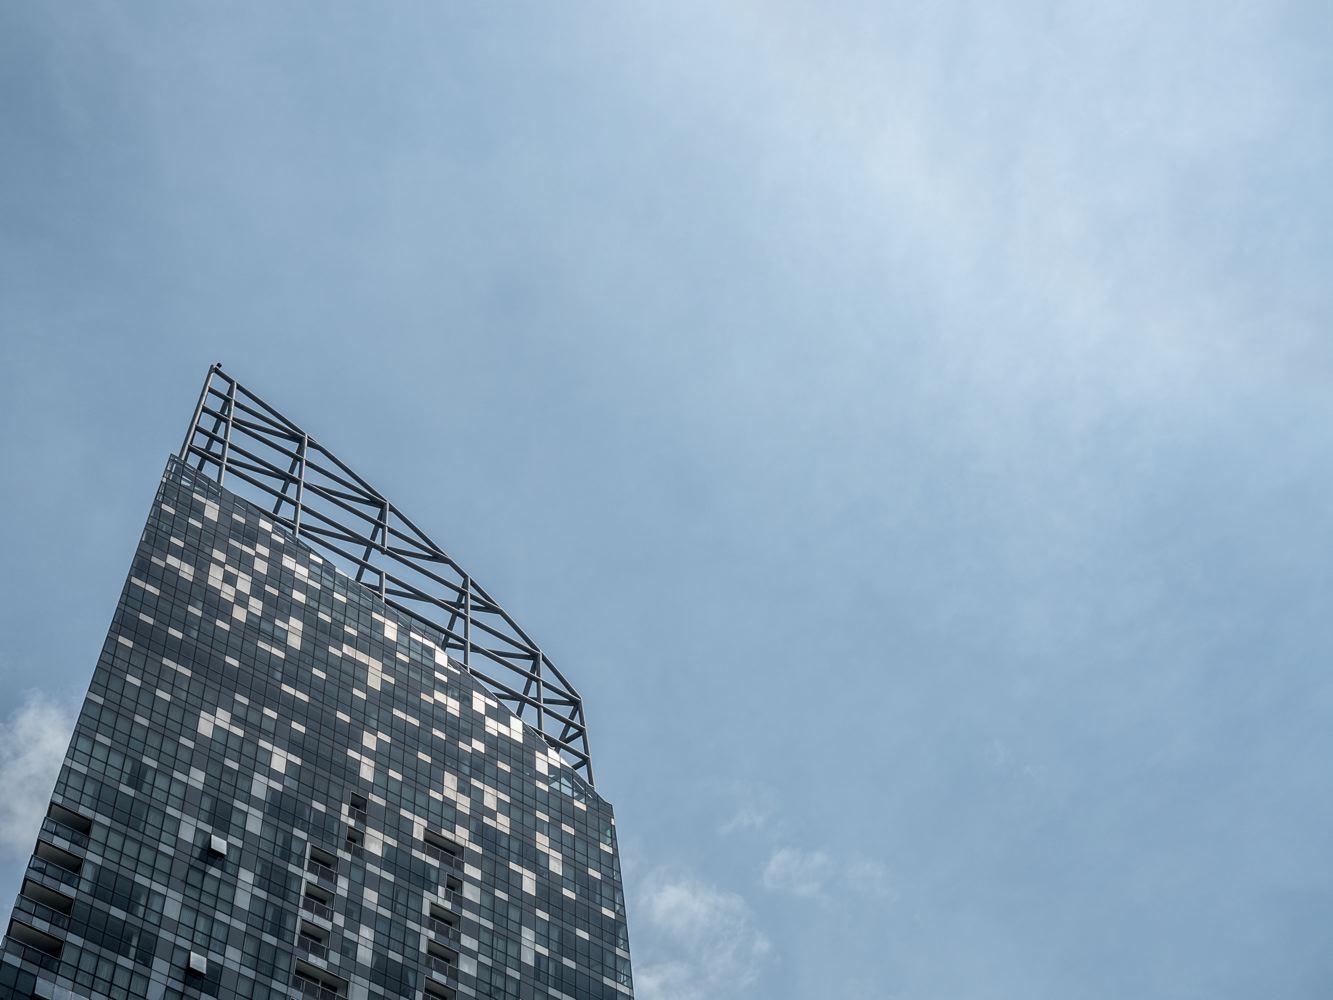 LDKphoto-SINGAPORE - REFLECTIONS AT KEPPEL BAY-008.jpg